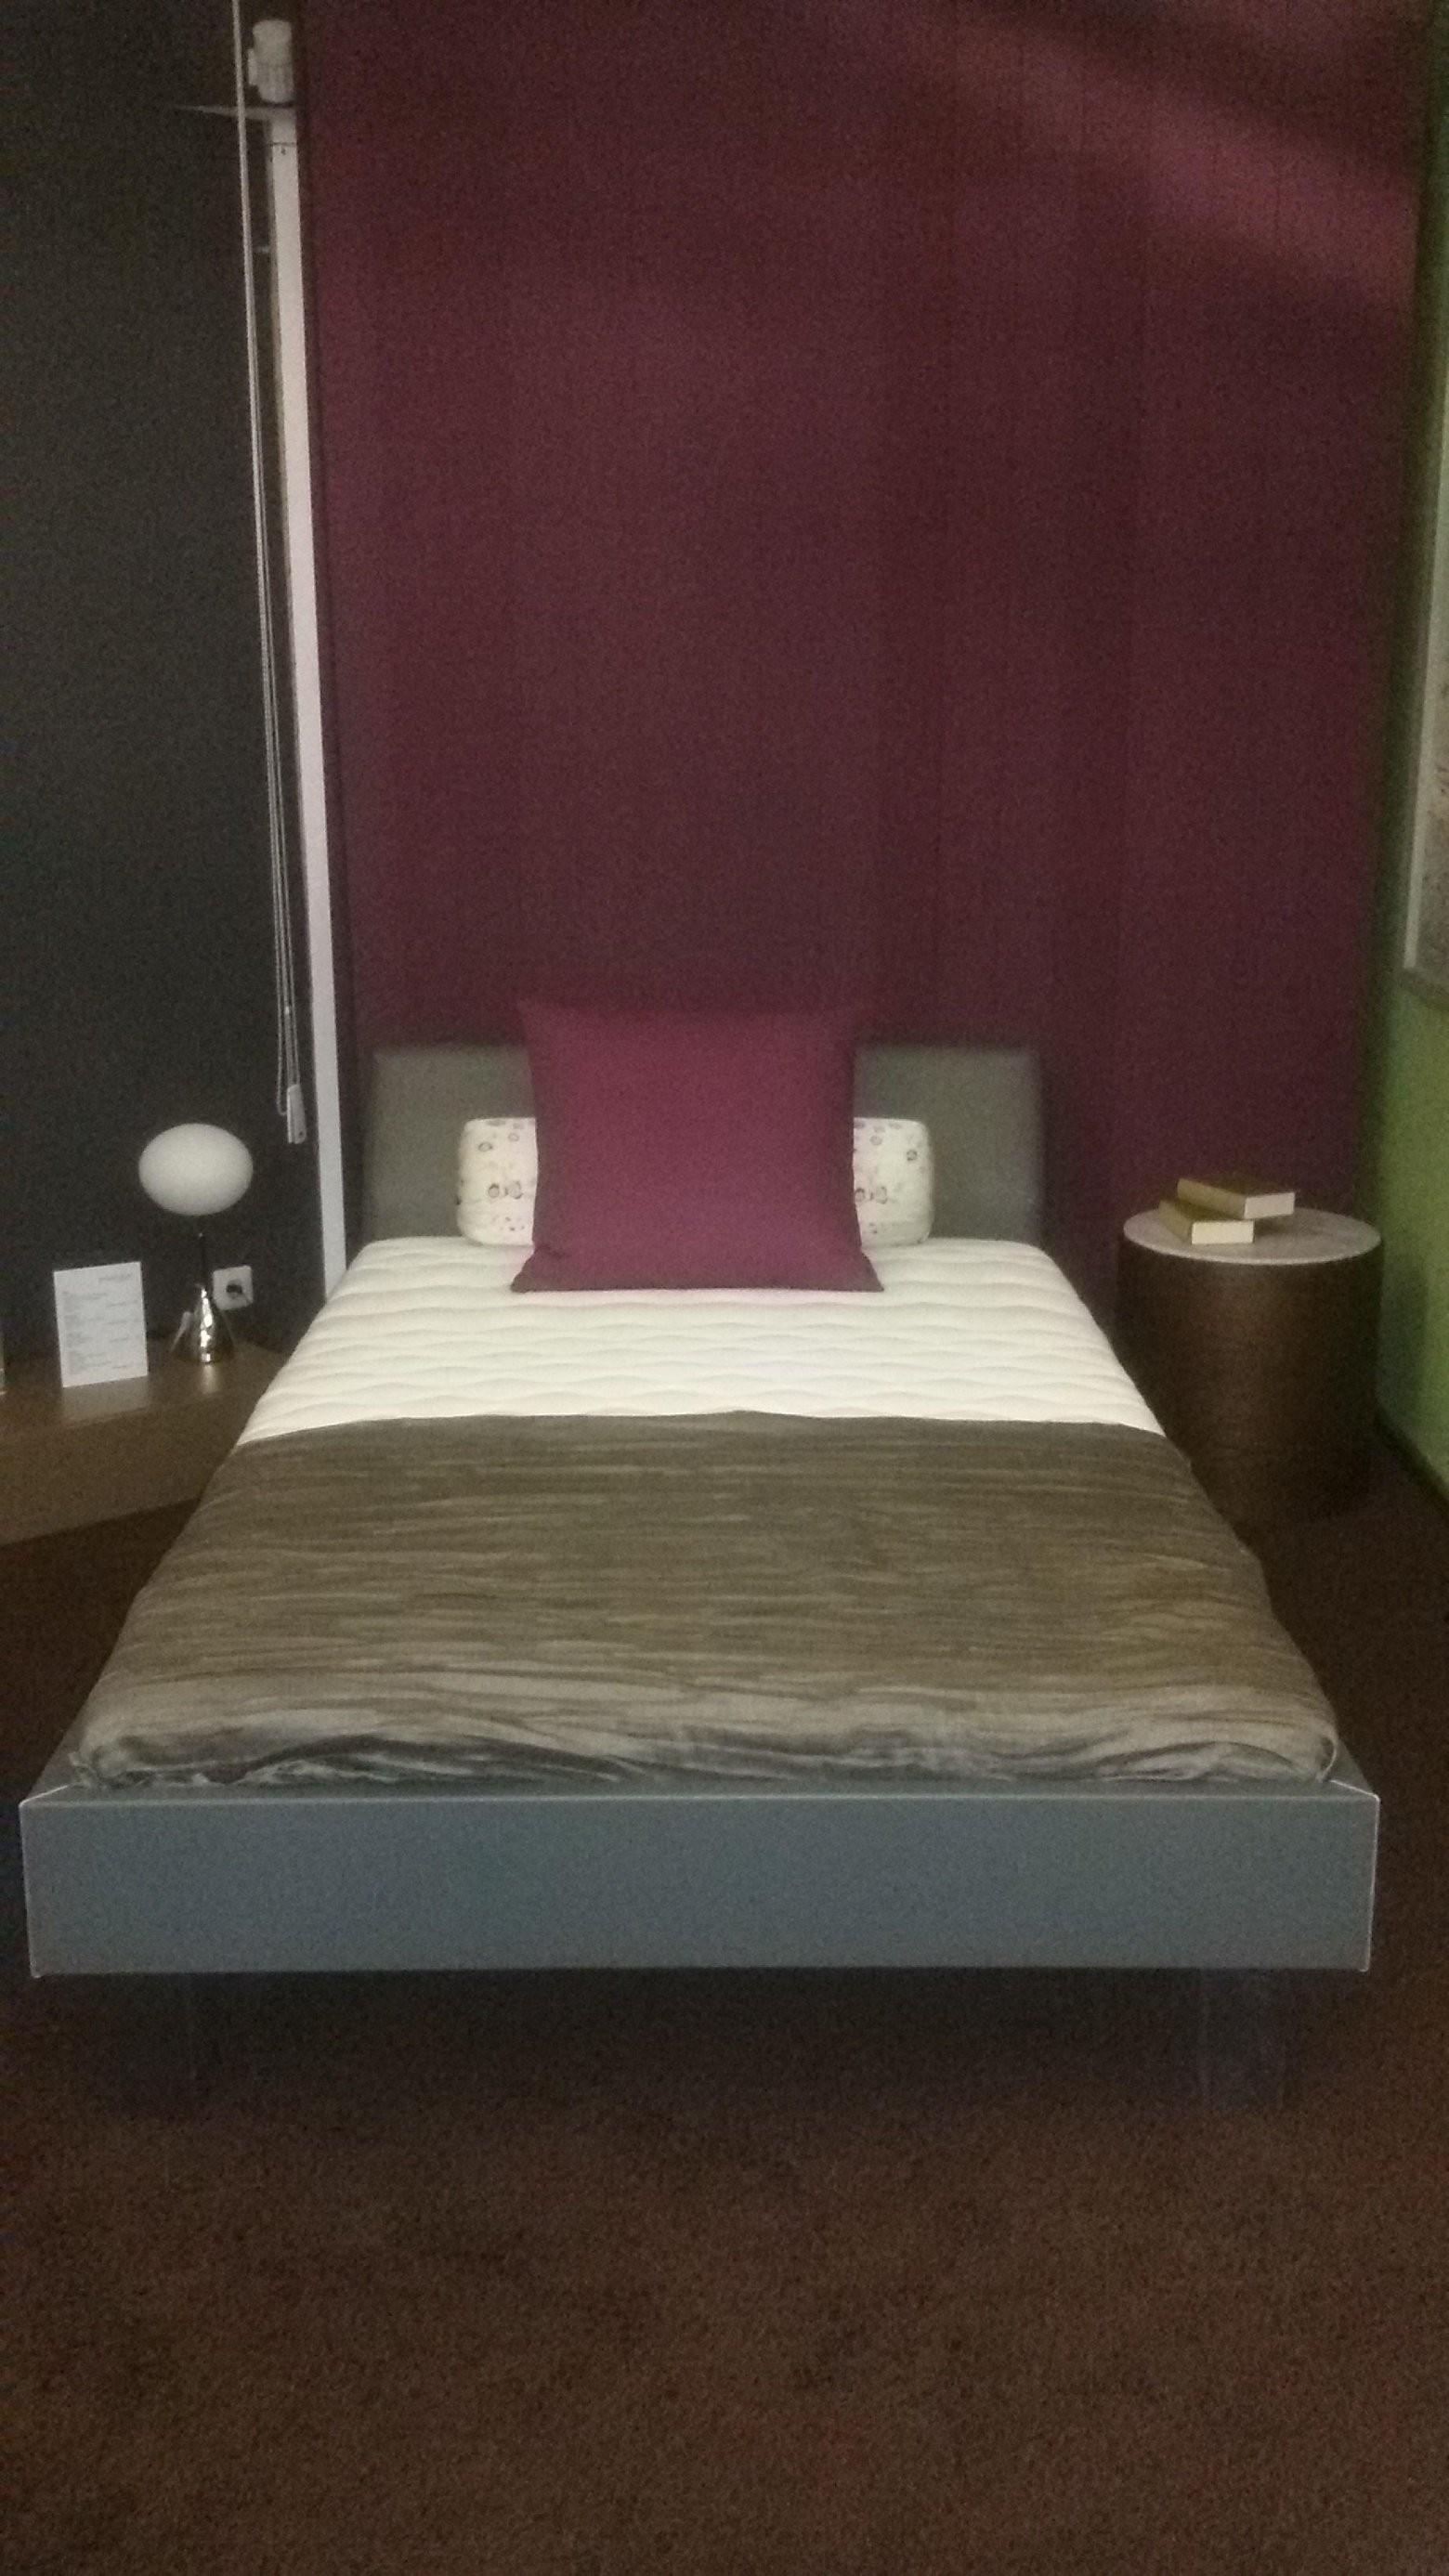 Wohnsinnspreise Bett Inkl Lattenrost Matratze Und Kissen von Bett Inklusive Lattenrost Und Matratze Bild